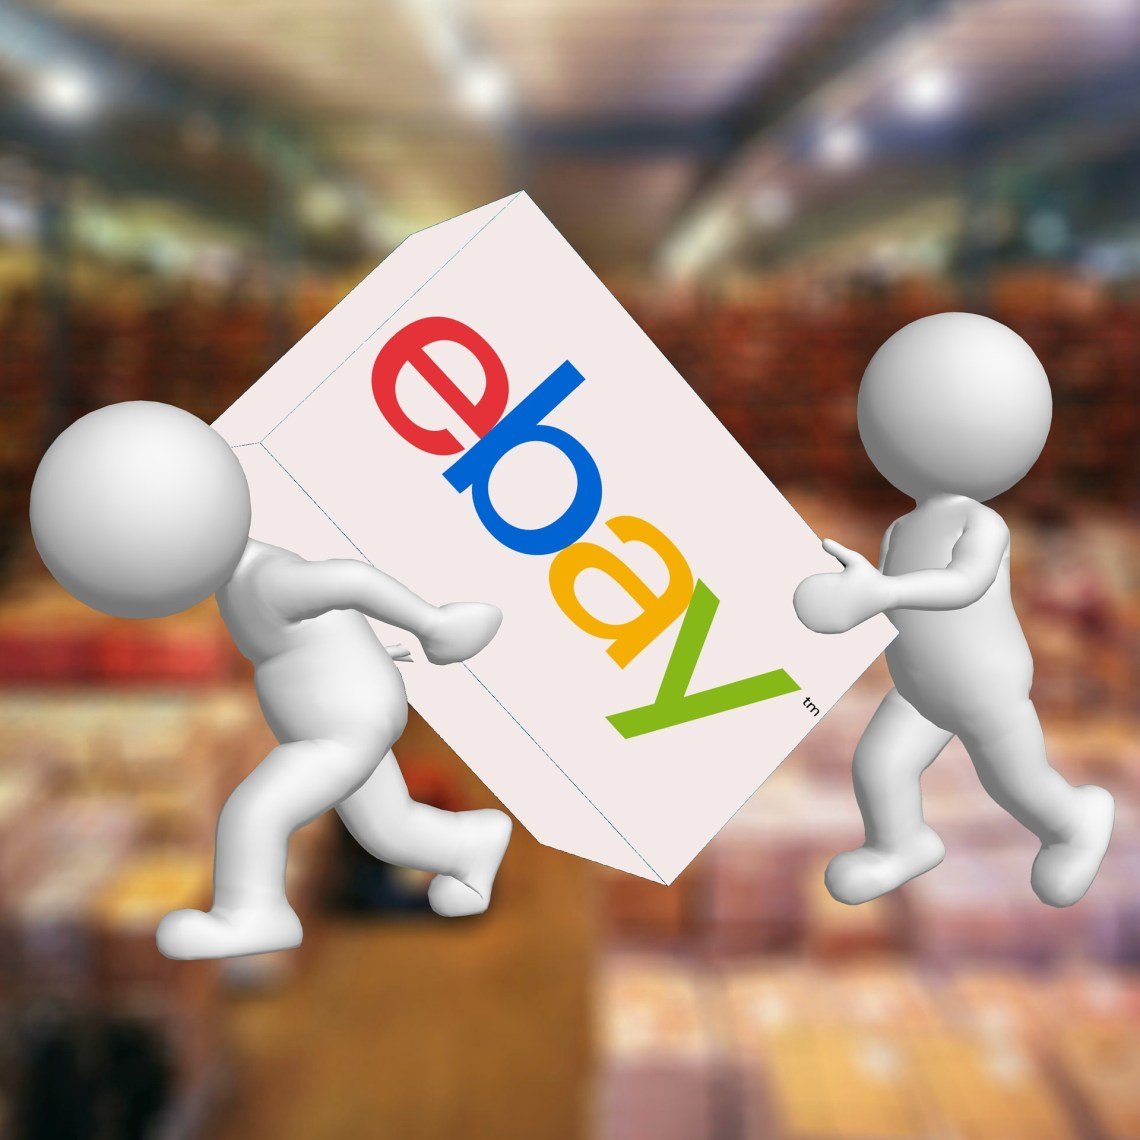 Tips On Buying Items On Ebay